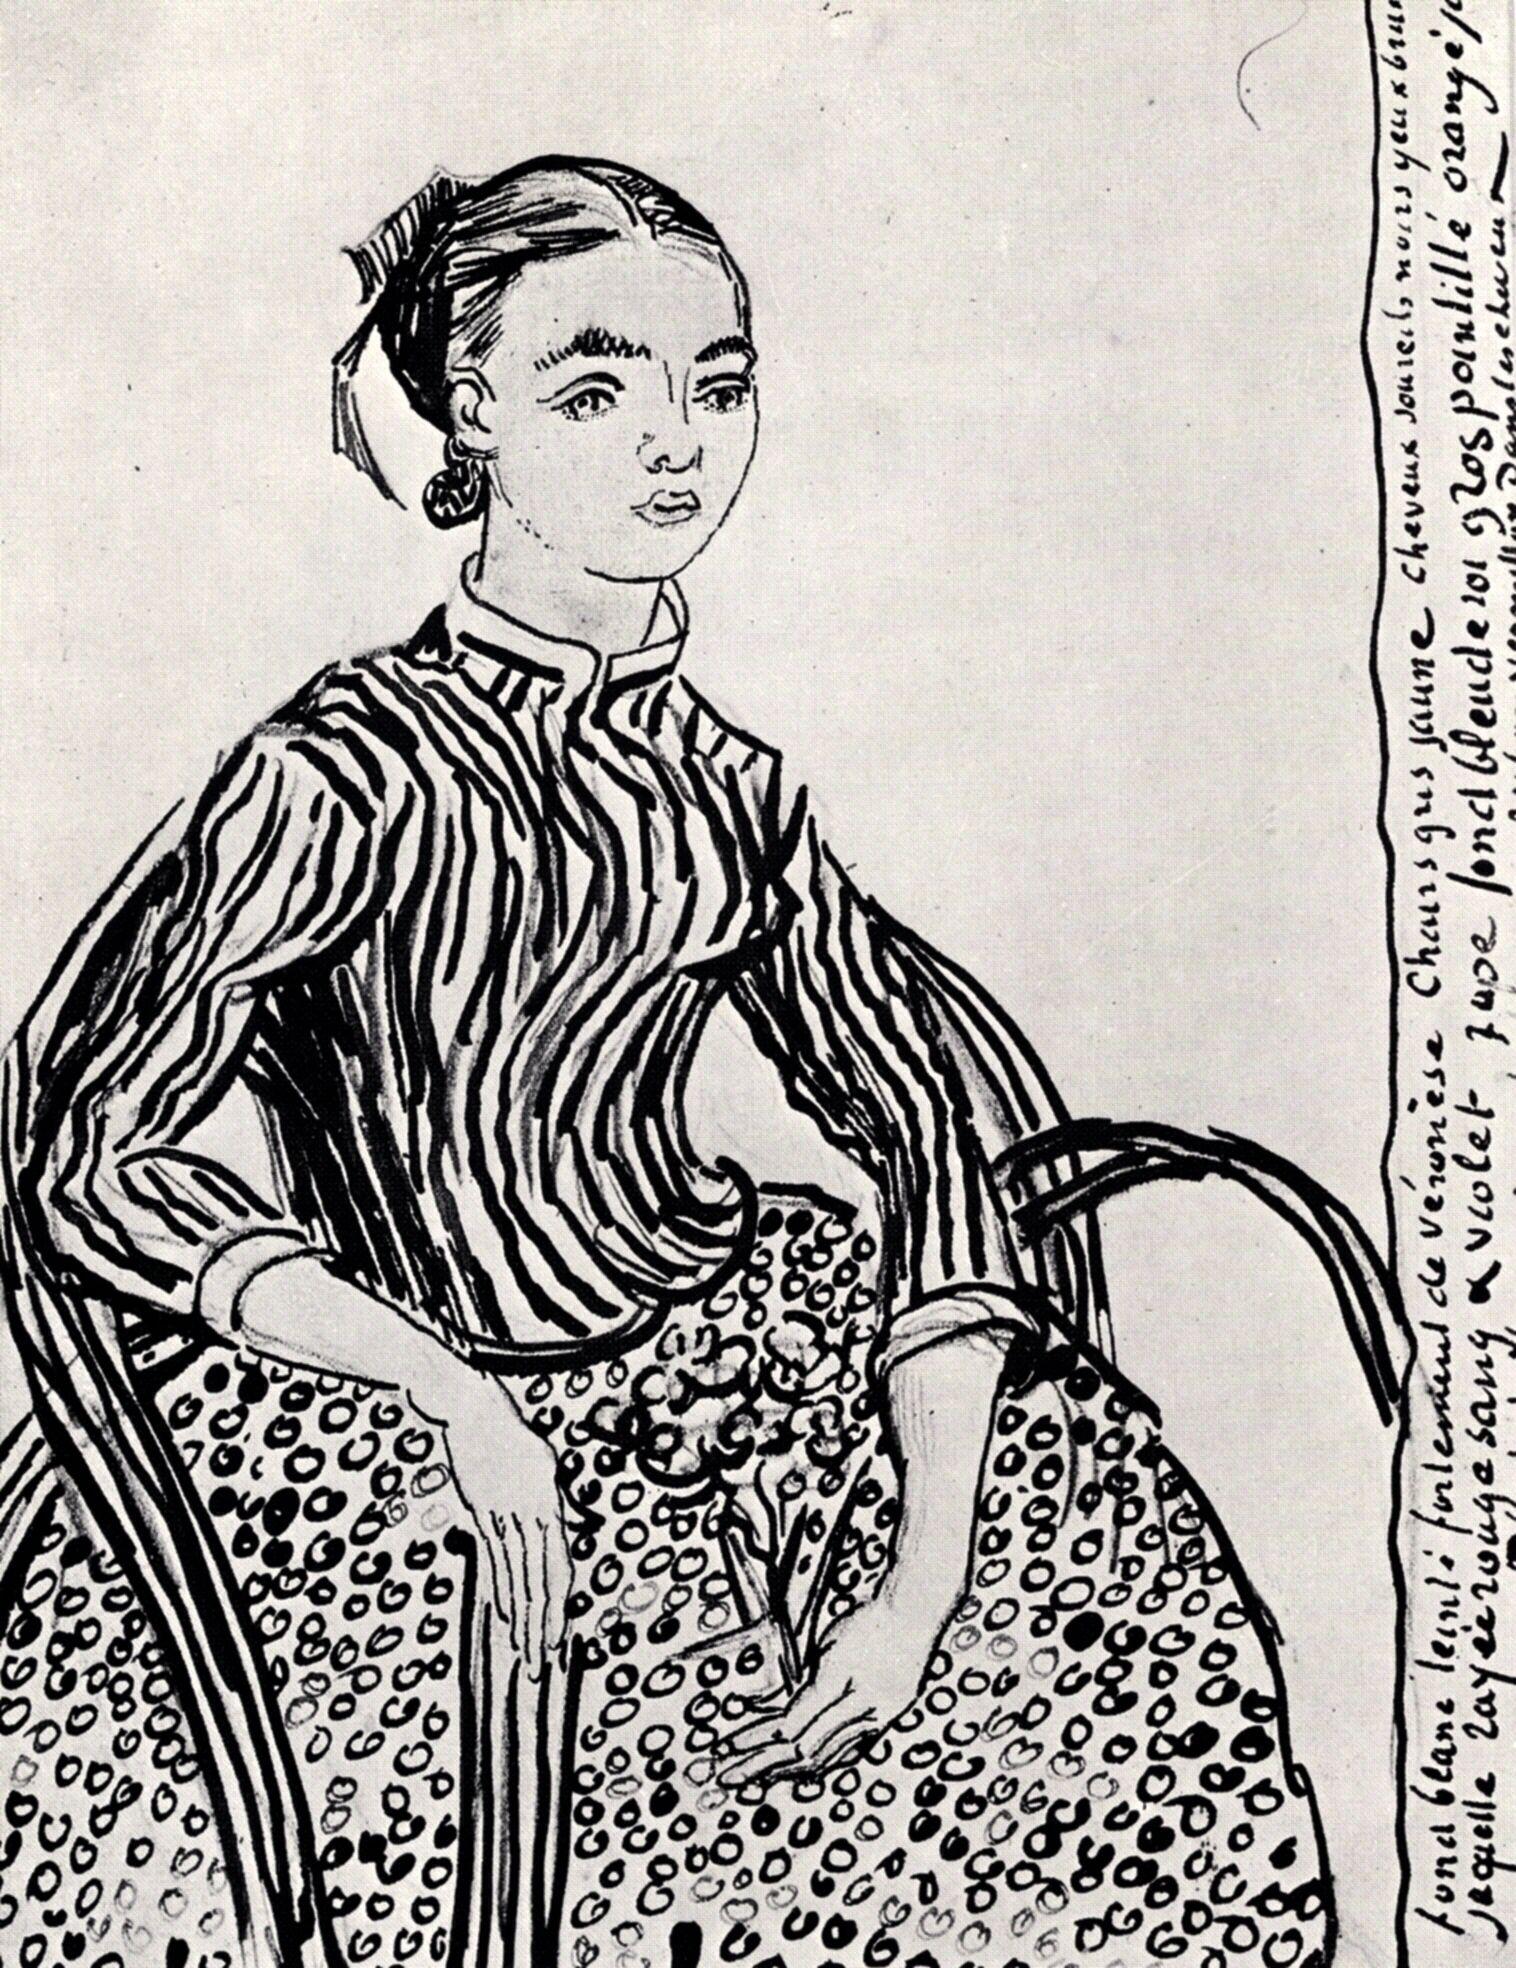 A mousmé, sitting - Vincent van Gogh. Completed by : 1888, Arles, Bouches-du-Rhone, France. Style : Japonism. Genre : Portrait. | via wikipaintings.org